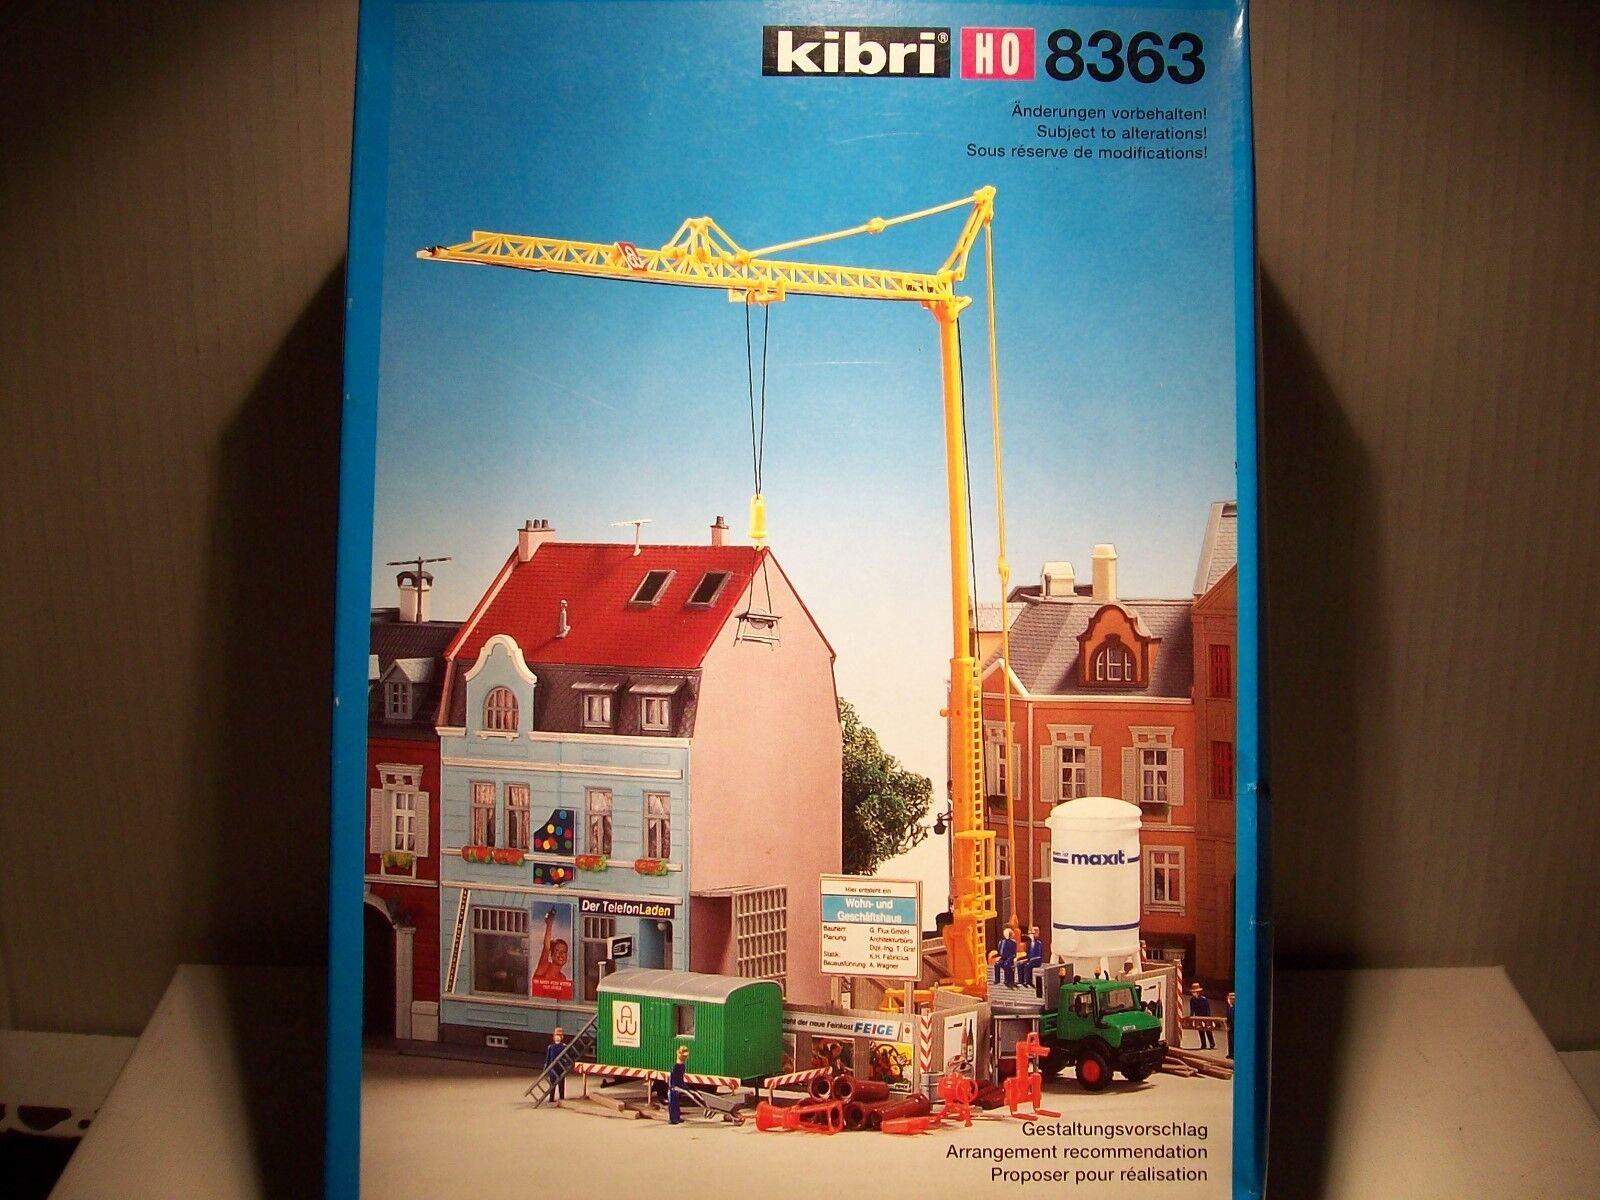 Kibri H0 8363 Bausatz  City-Baustelle mit Baukran  - Neu  OVP  | König der Quantität